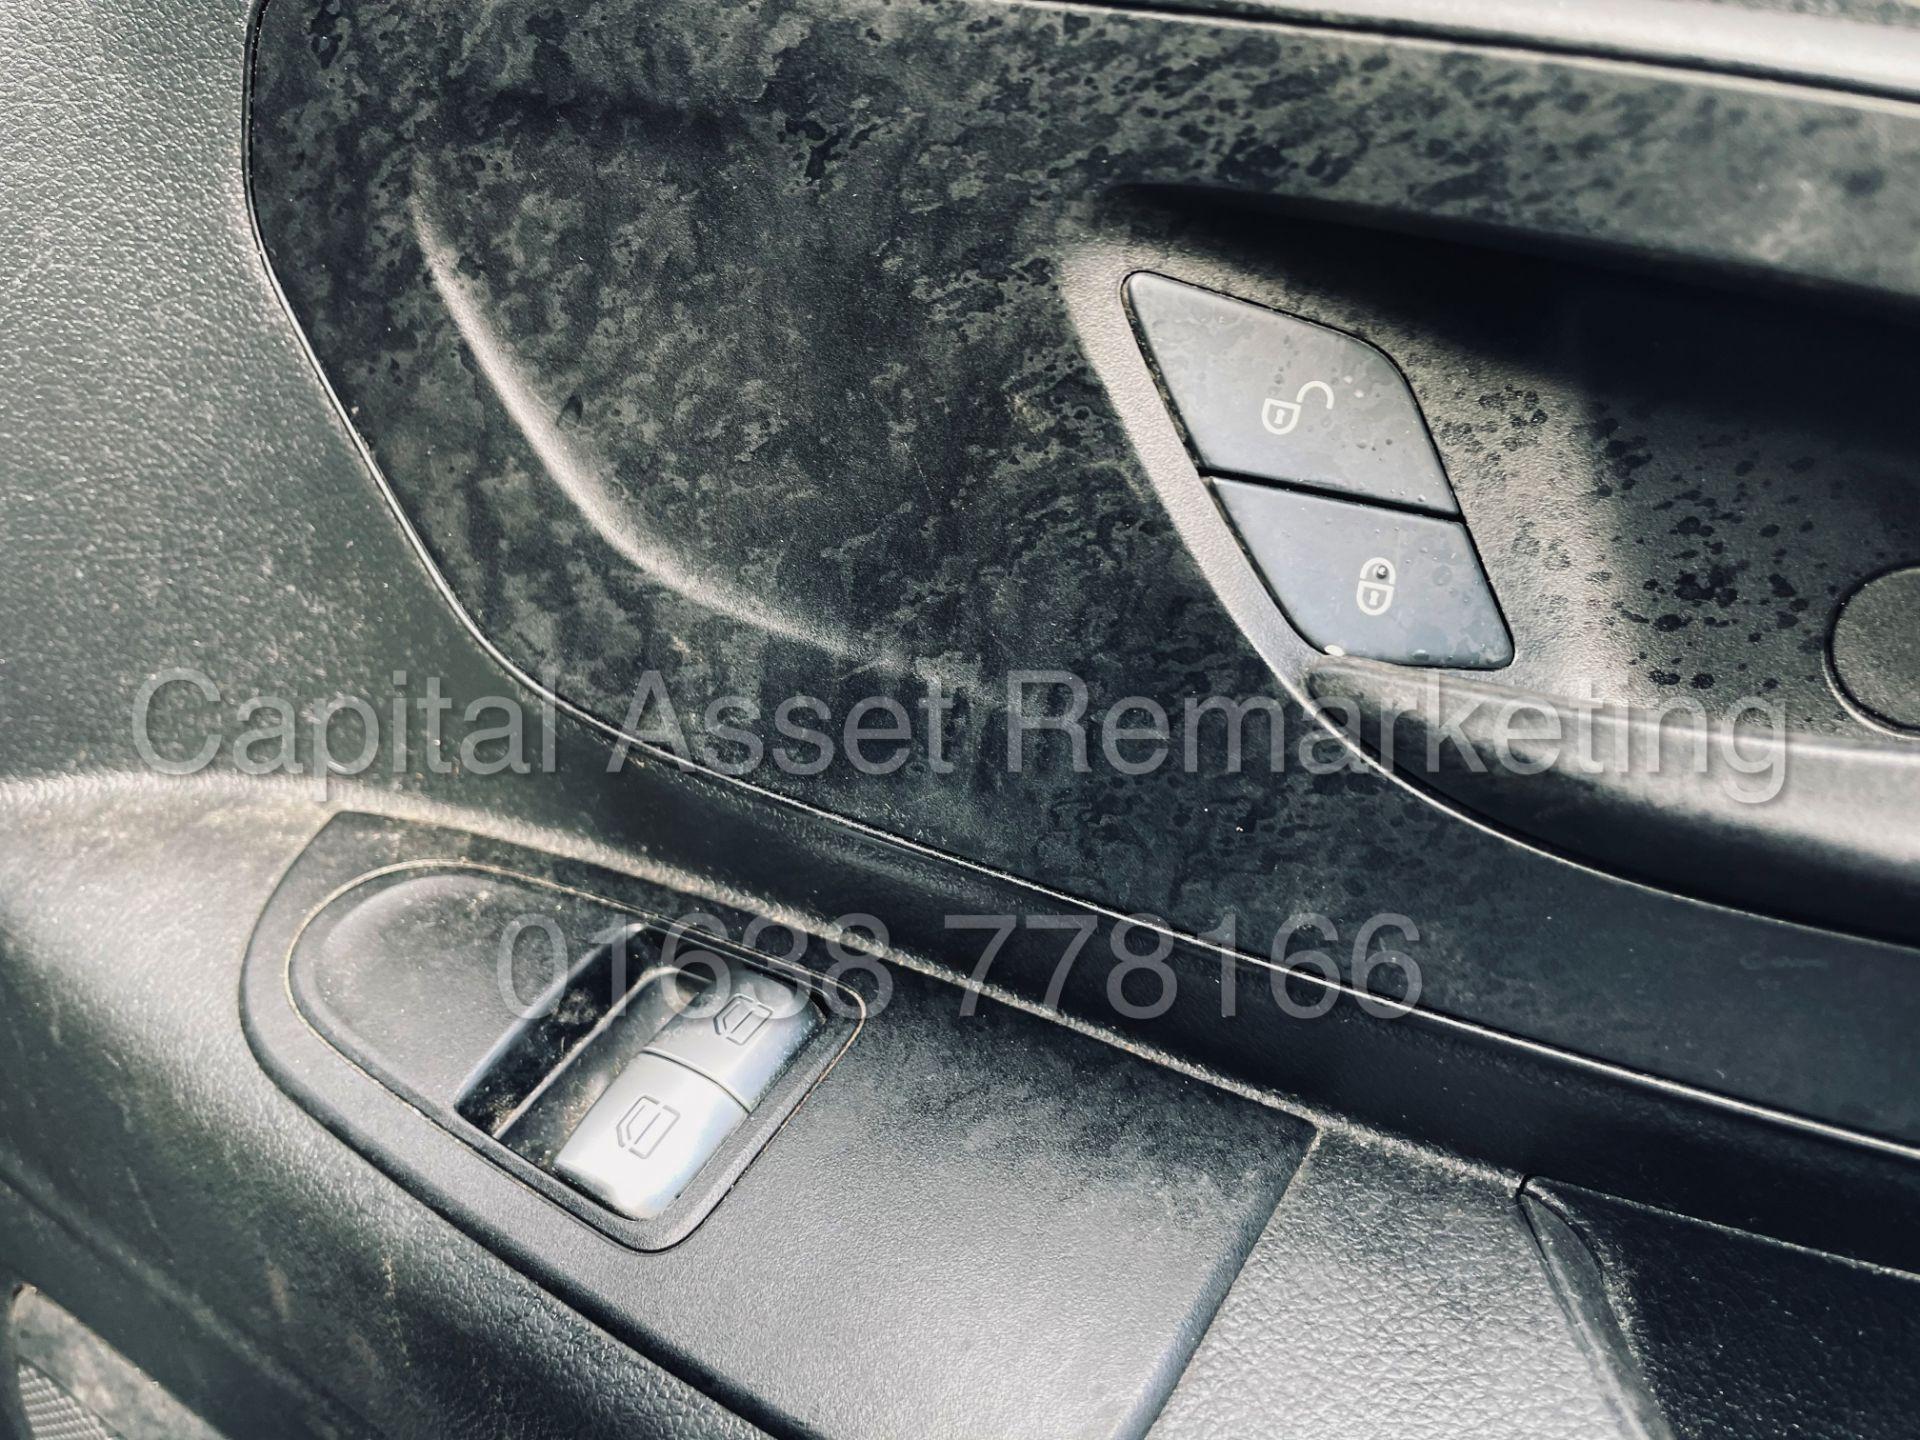 (On Sale) MERCEDES-BENZ VITO 114 *LWB -PANEL VAN* (2017 - EURO 6) '134 BHP - 6 SPEED' *65,000 MILES* - Image 21 of 34